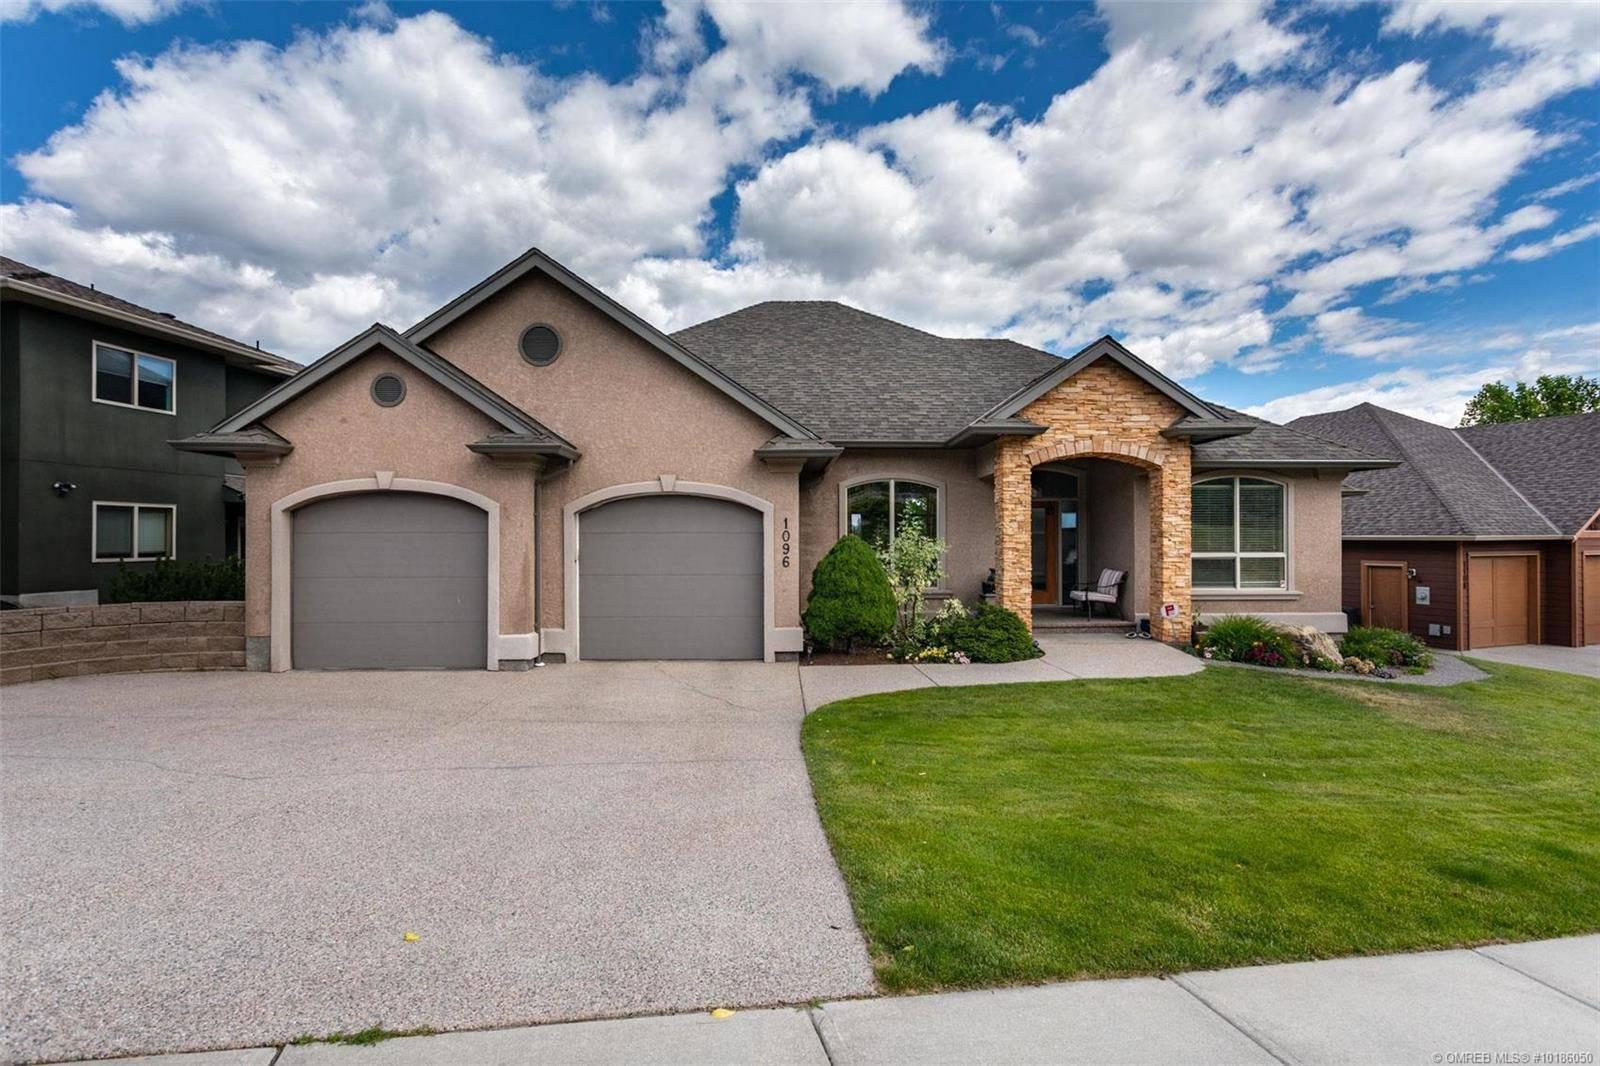 House for sale at 1096 Arbor View Dr Kelowna British Columbia - MLS: 10186050